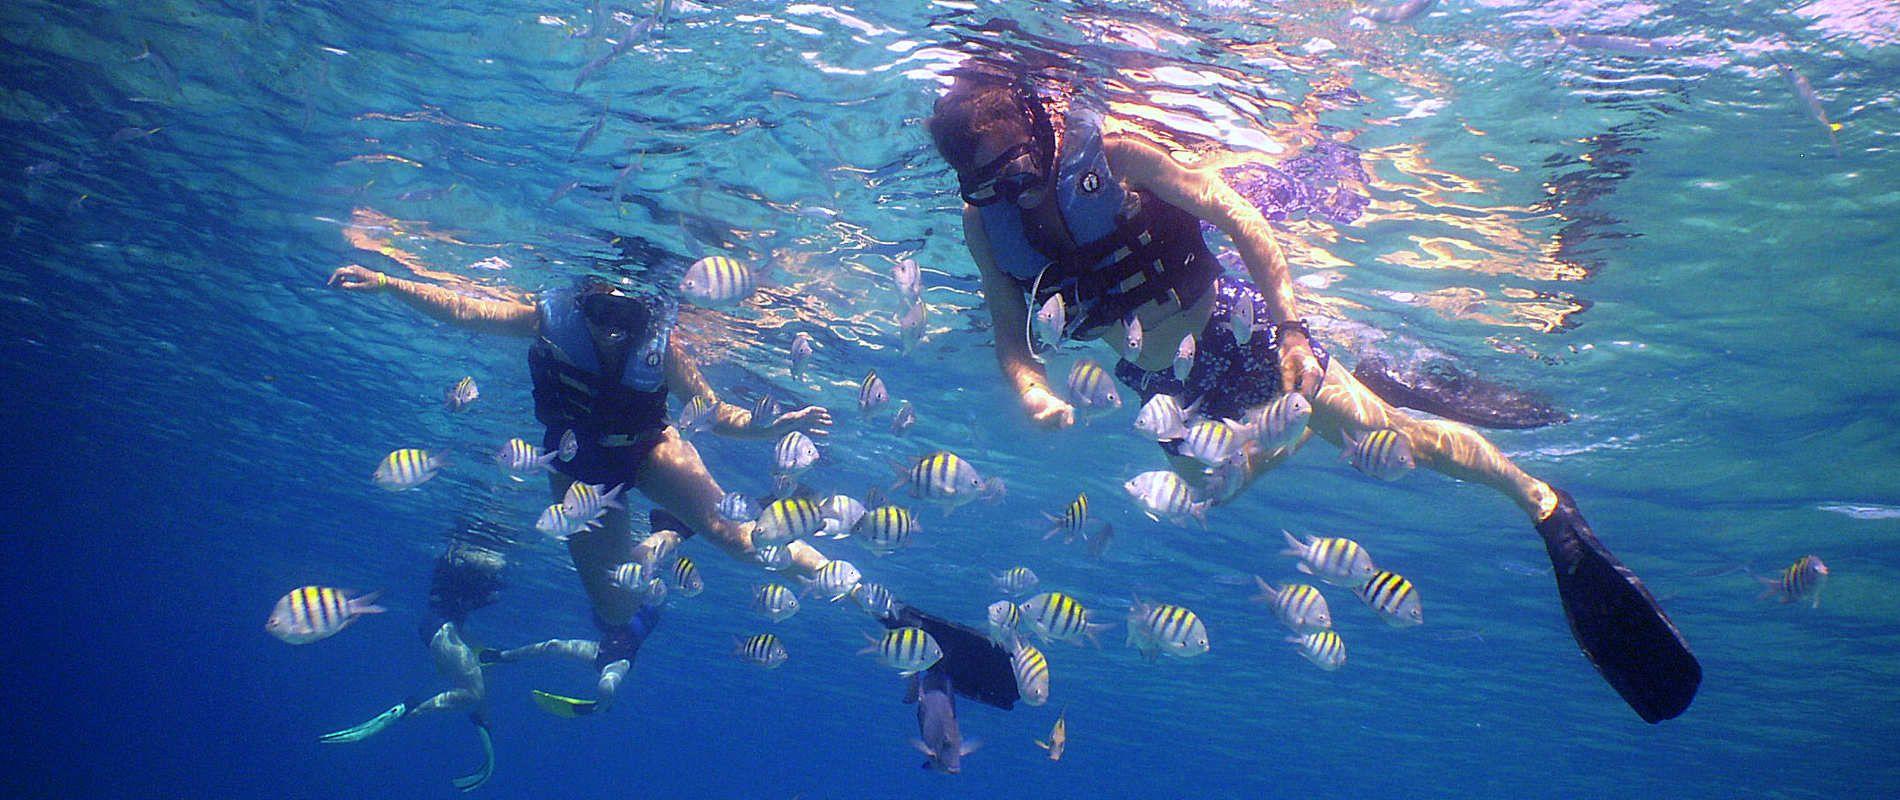 Divers Snorkeling